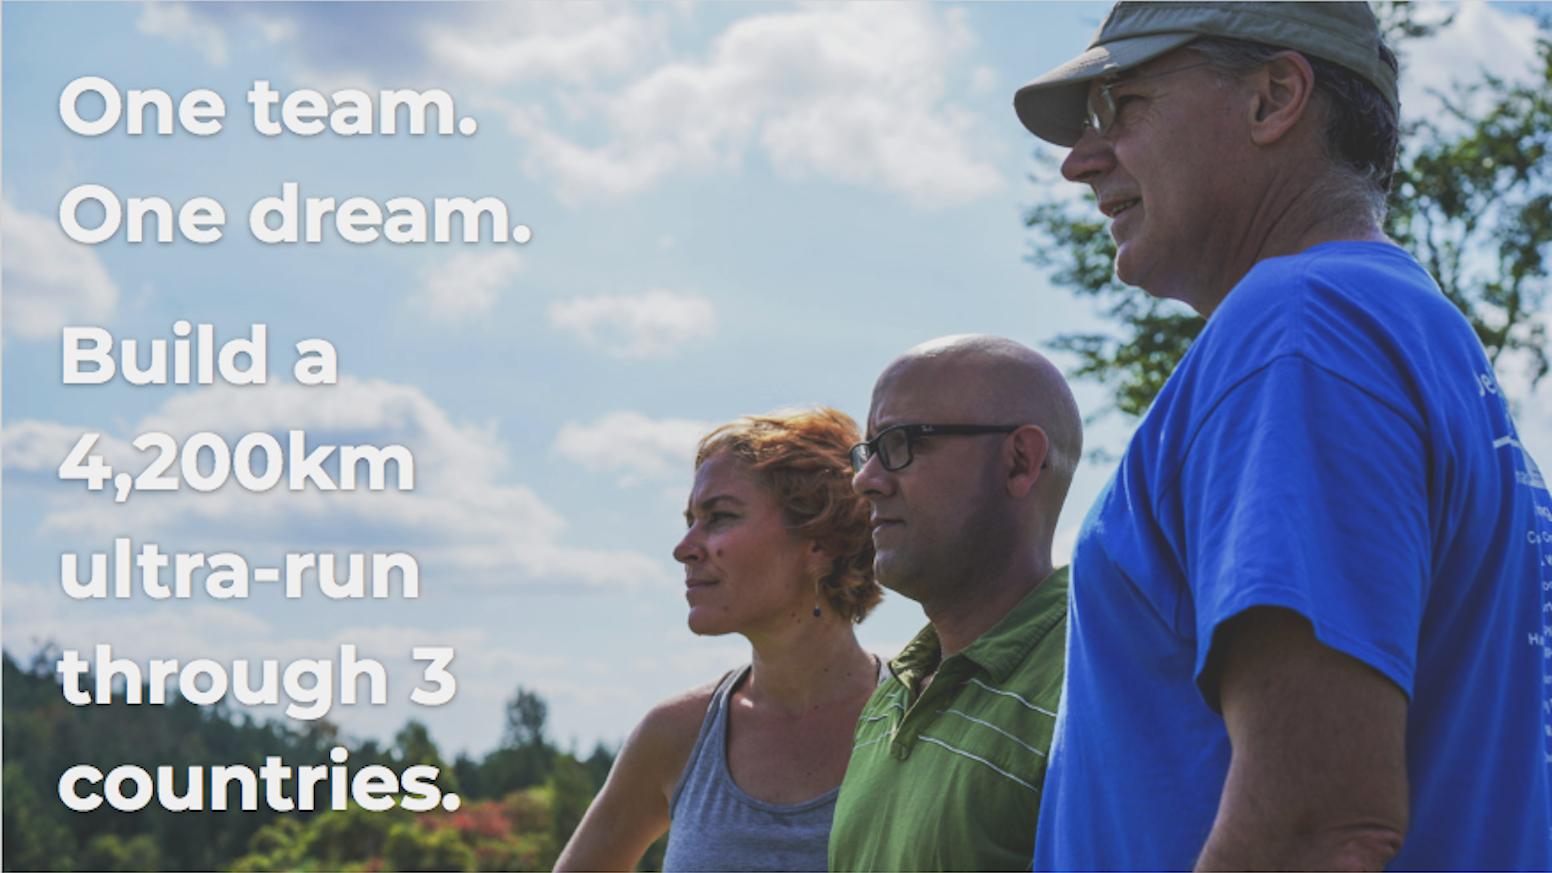 An inspiring adventure that follows the team creating the epic Monarch Ultra relay, a 4,200 km ultra-run through North America.